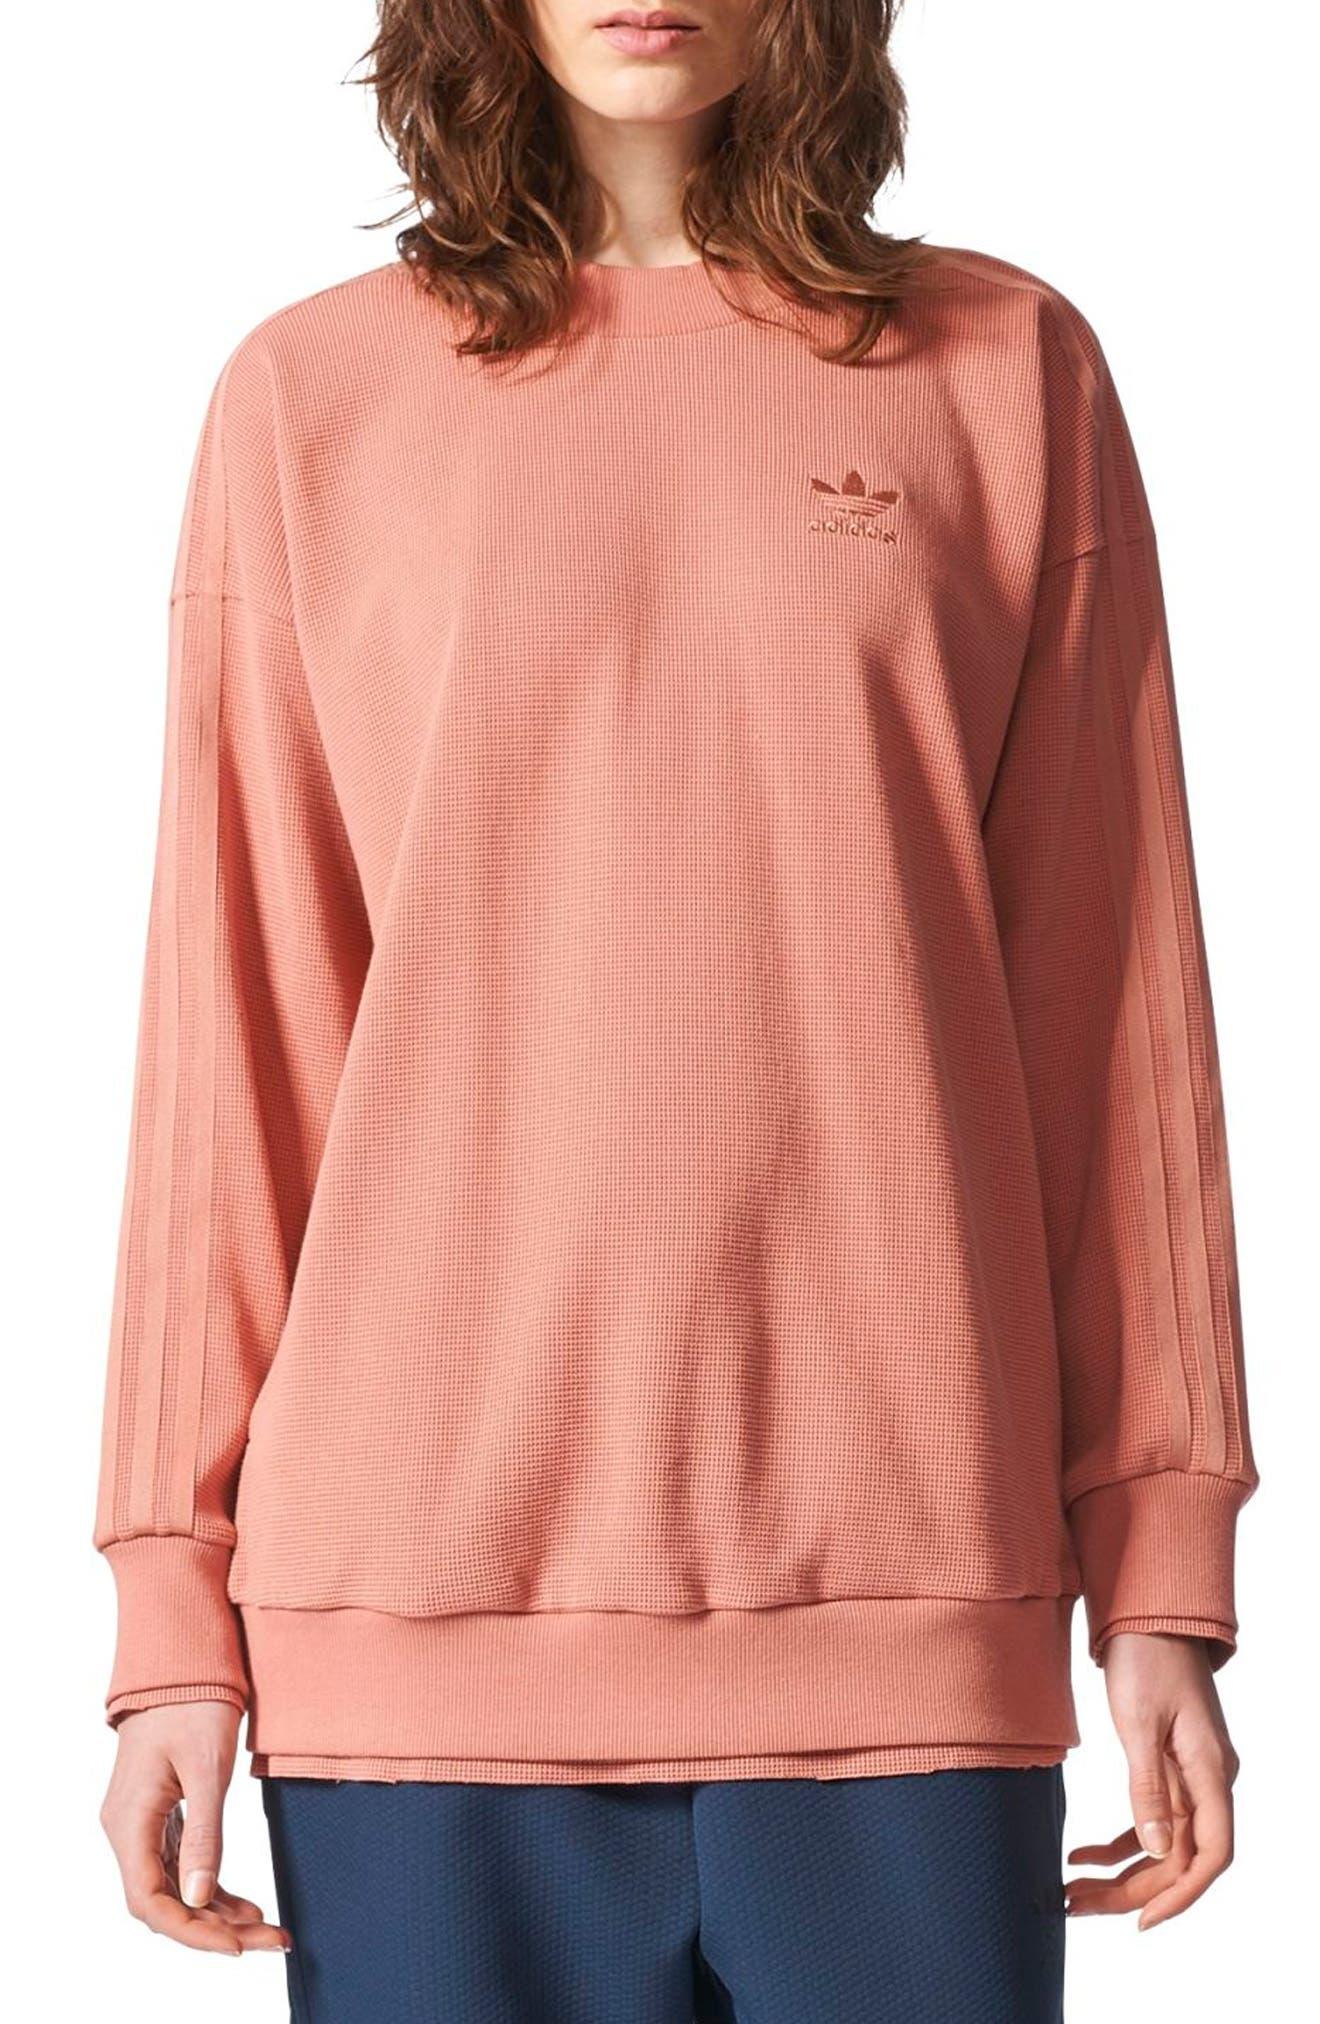 Originals Thermal Sweatshirt,                         Main,                         color, Raw Pink